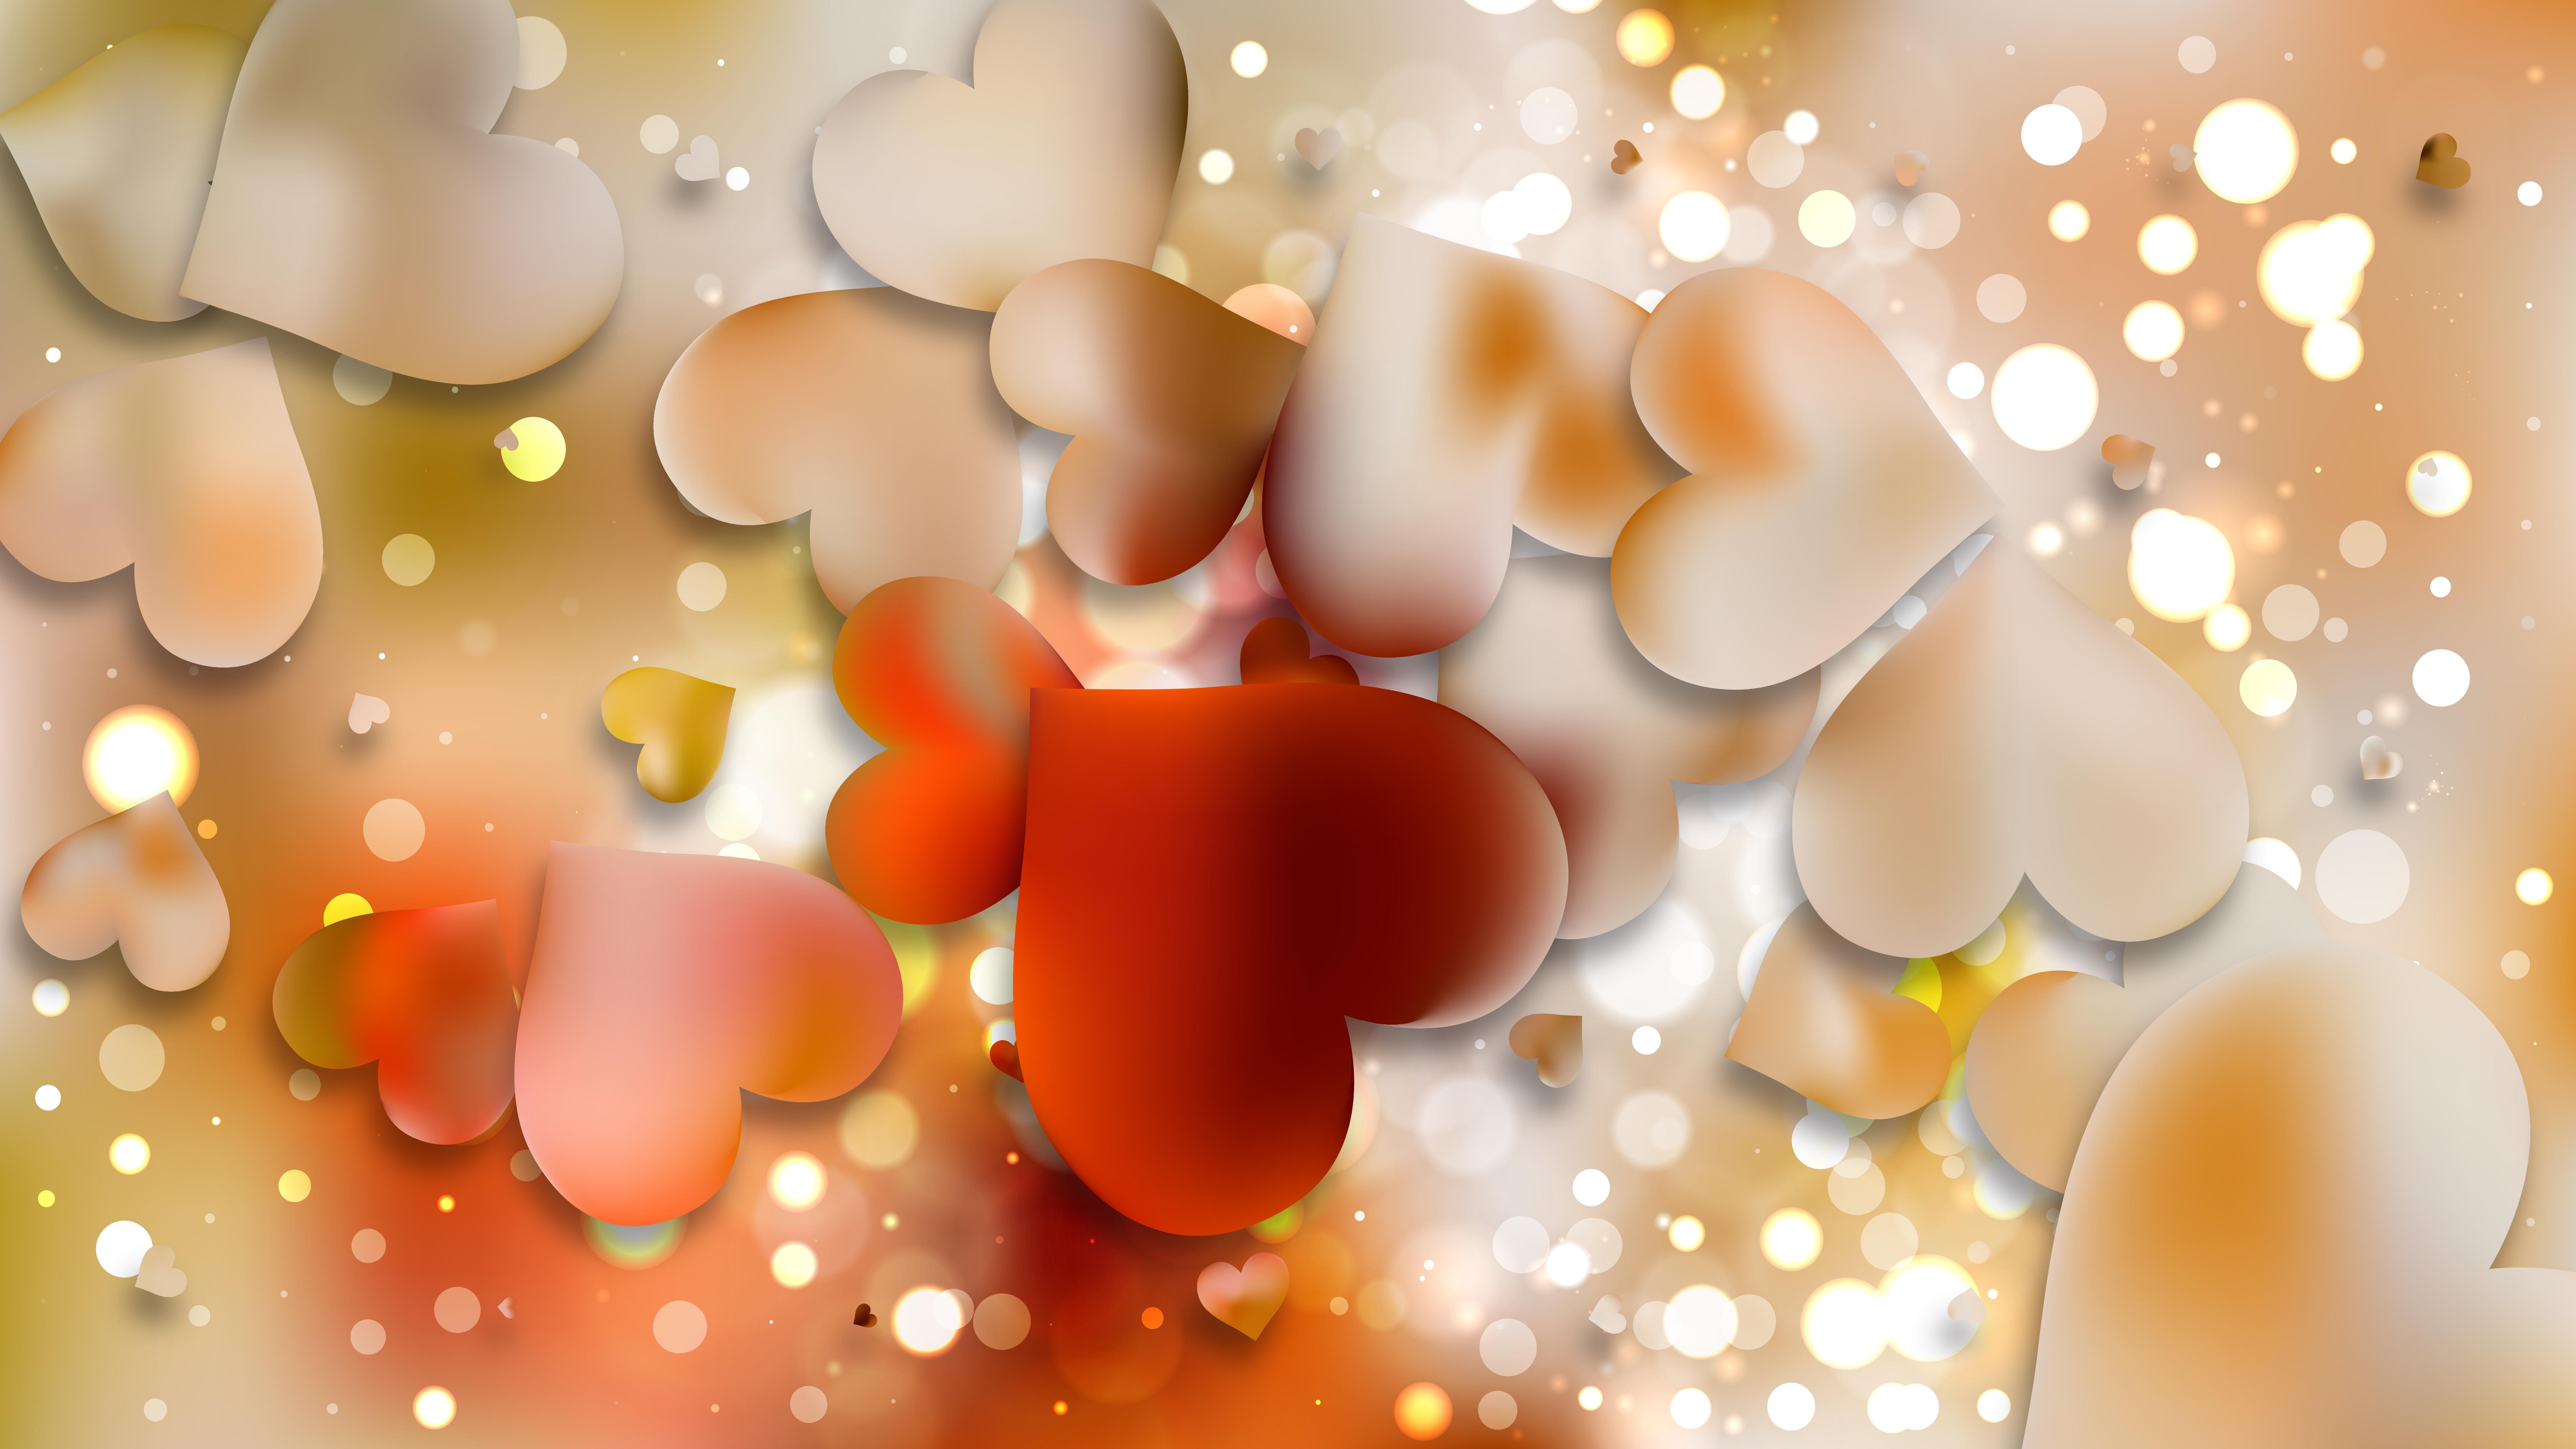 Light Color Heart Wallpaper Background Illustration - Light Color - HD Wallpaper